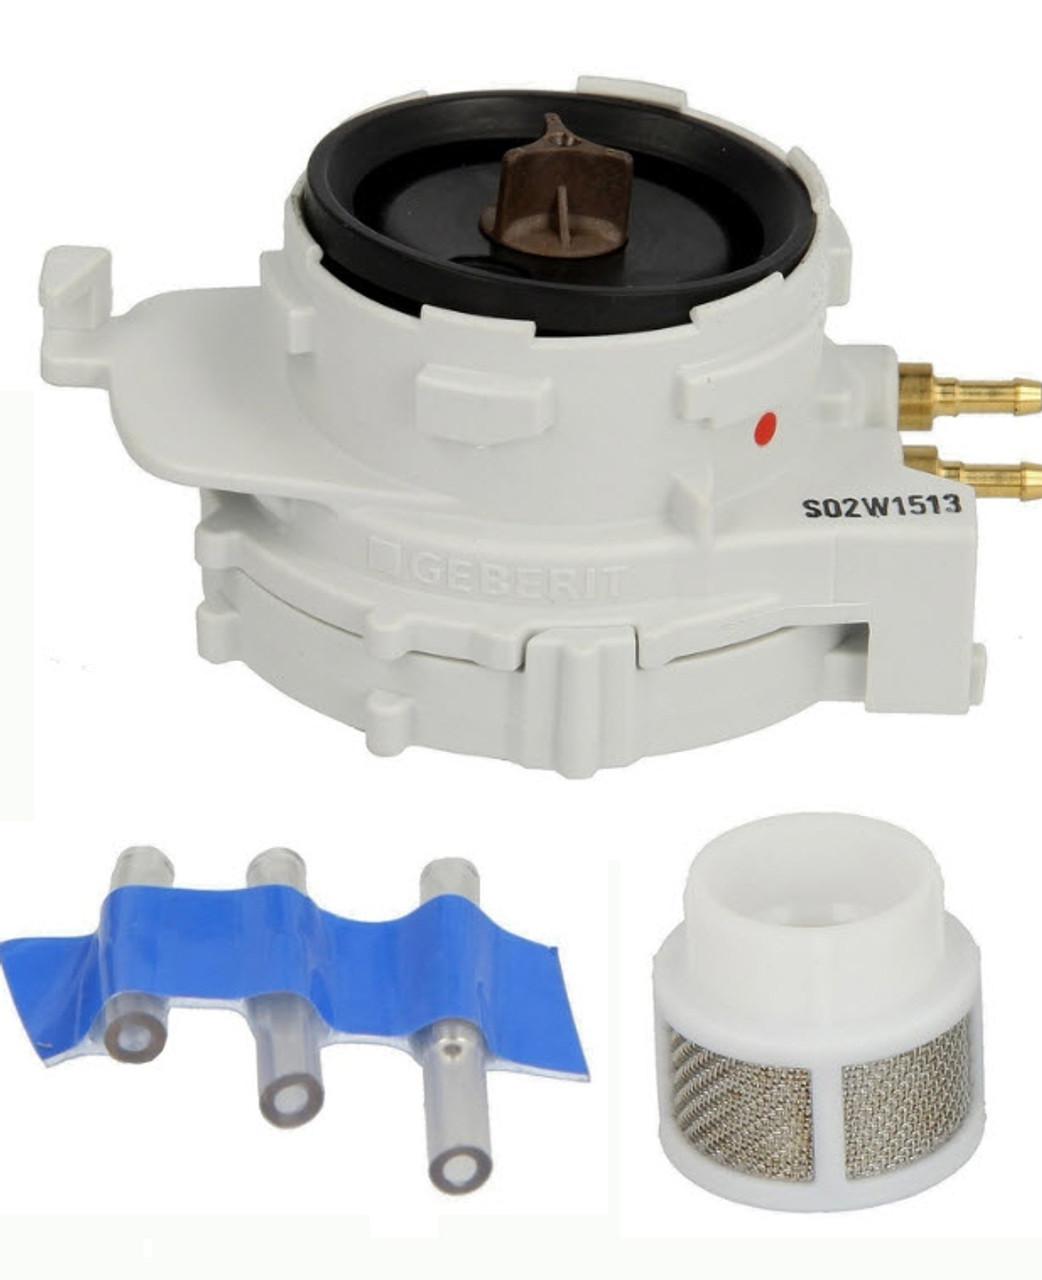 Geberit pneumatic valve for urinal flush control, 240.519.00.1